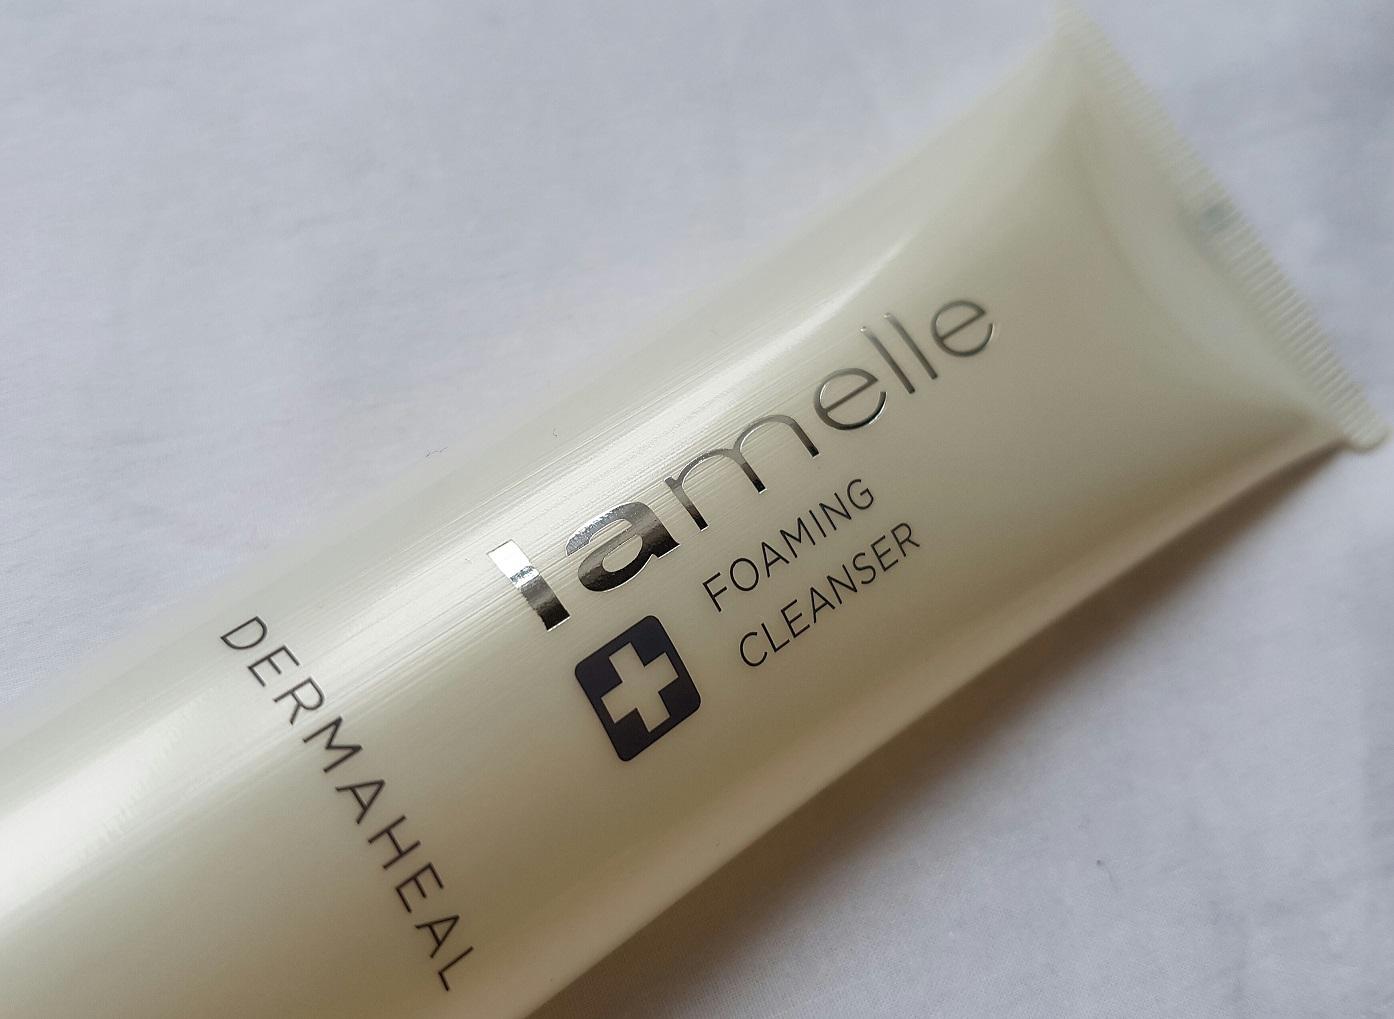 Lamelle Dermaheal Foaming Cleanser